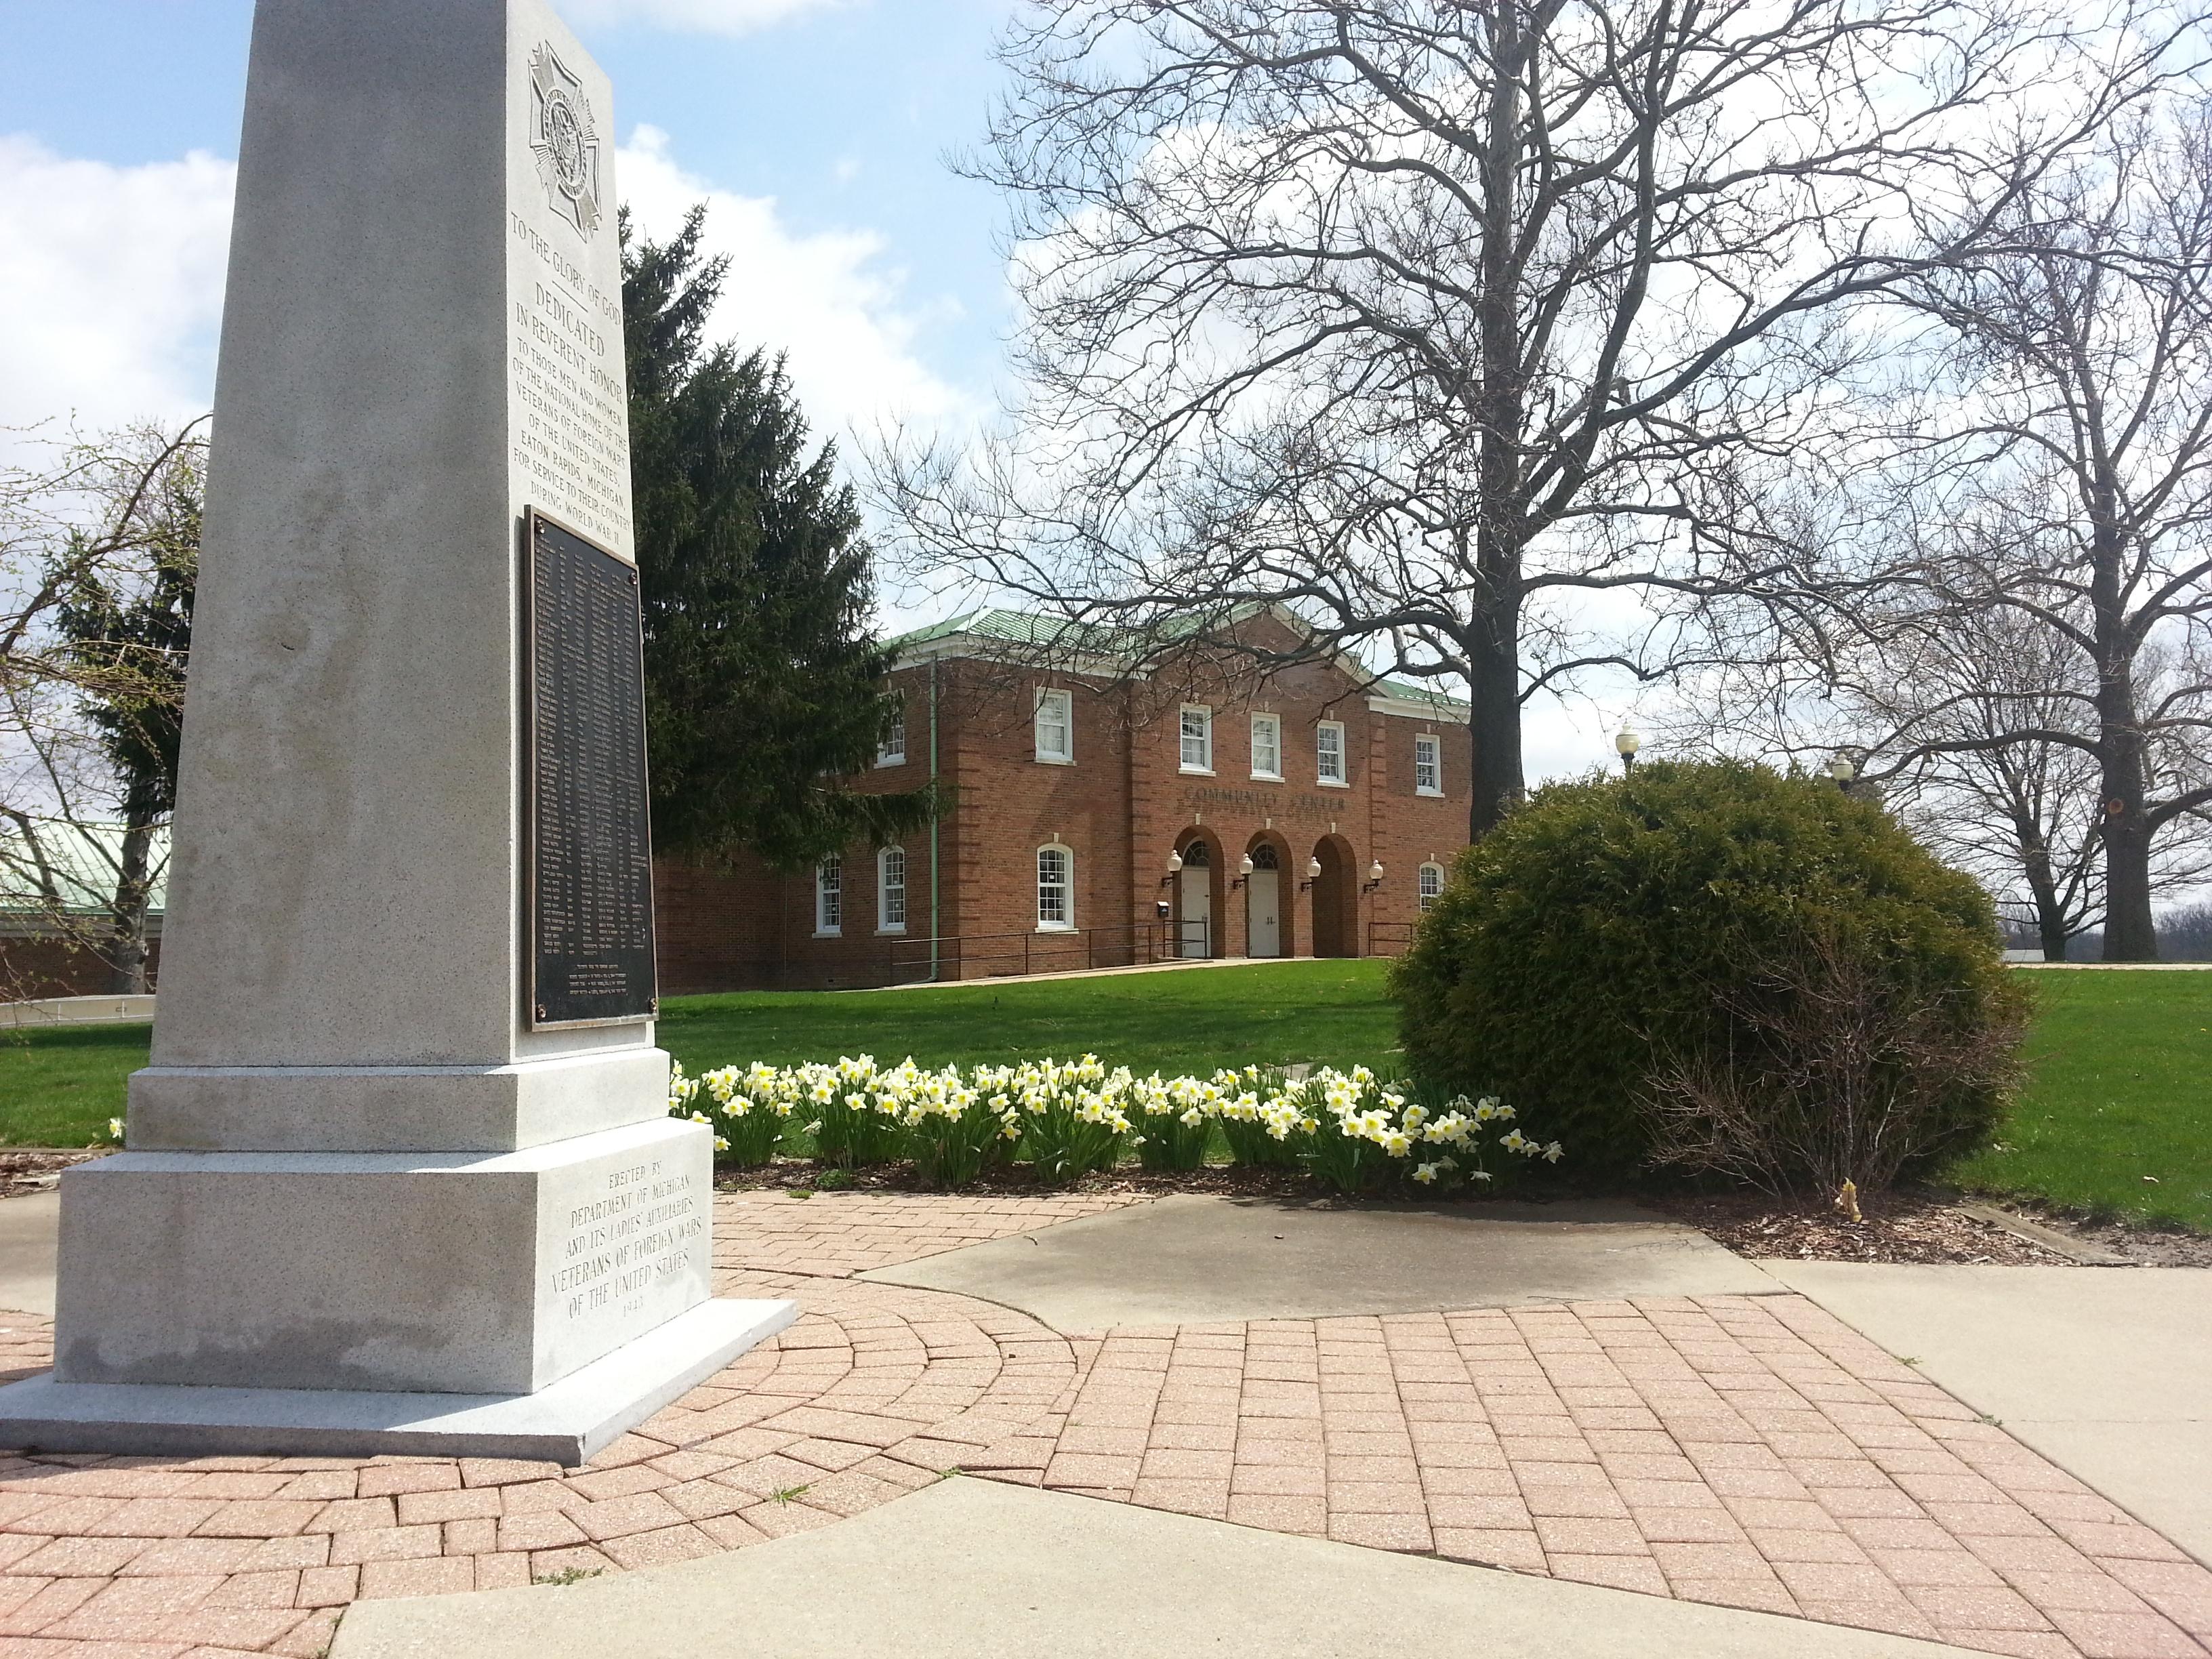 World War II Monument